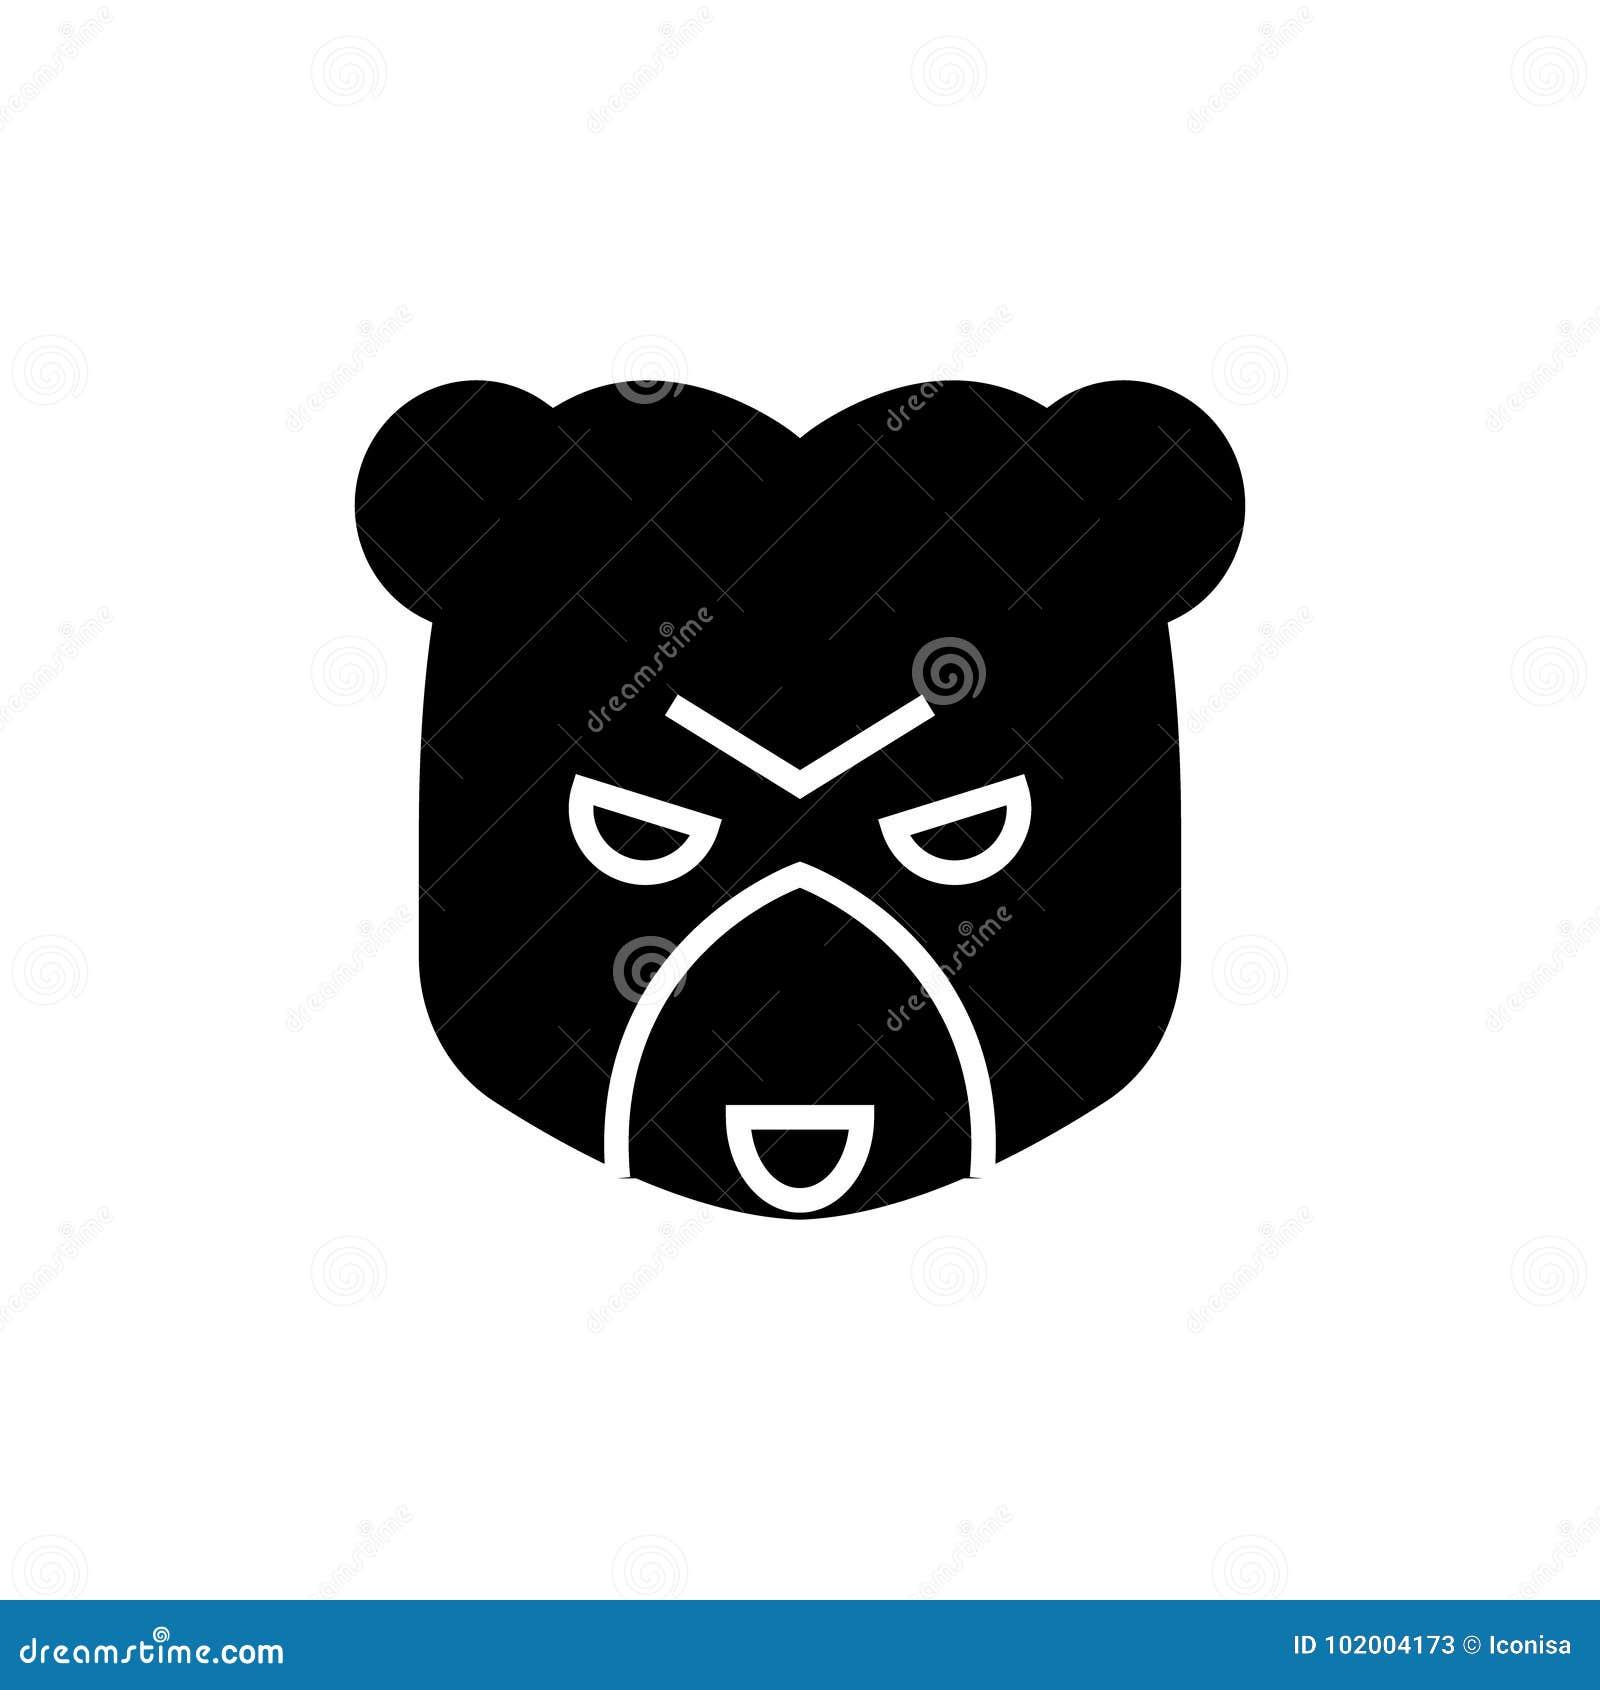 Bear market icon, vector illustration, black sign on isolated background